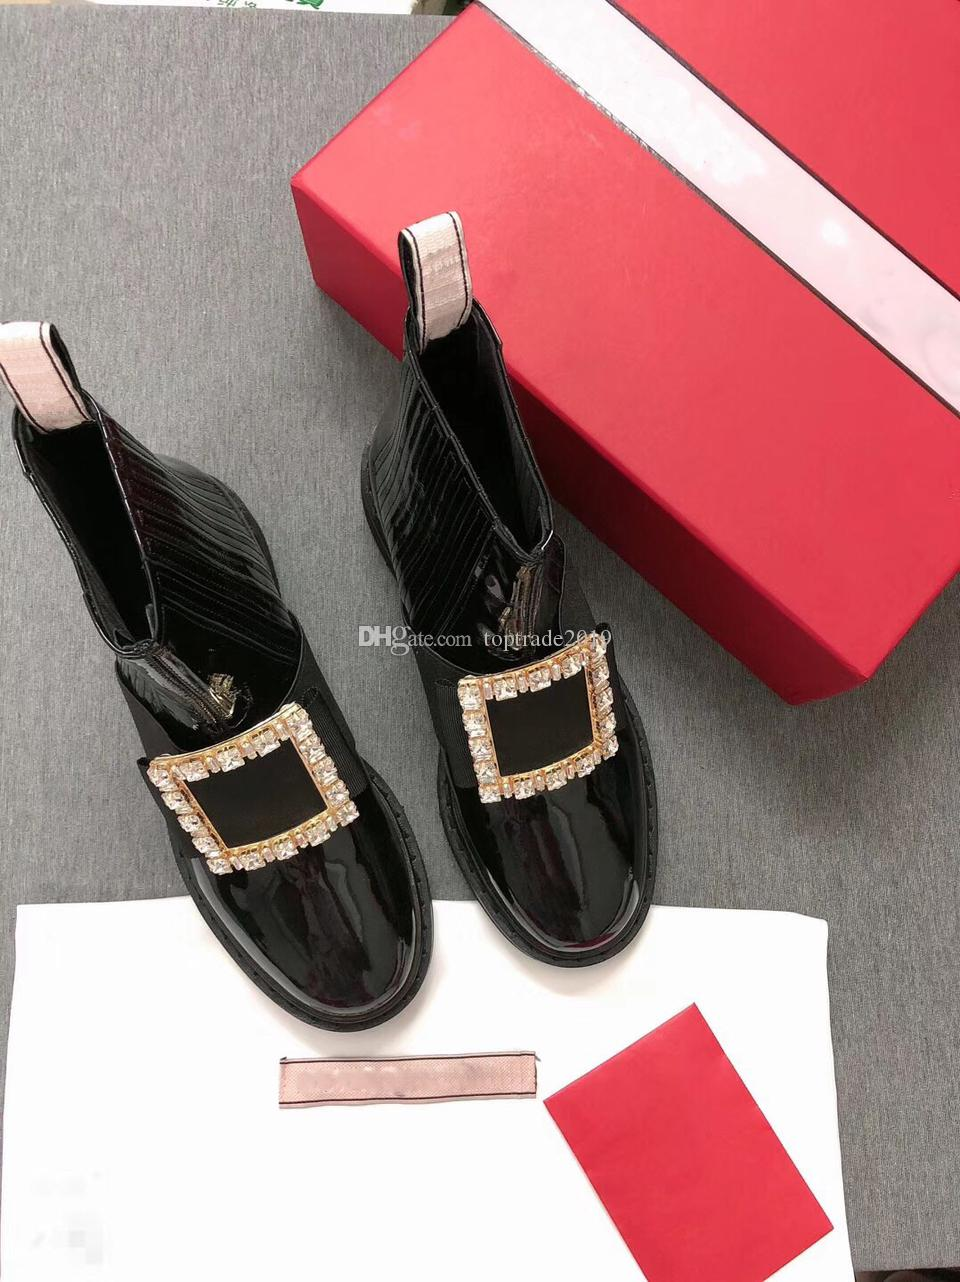 Damenschuhe Lackleder Damen Stiefeletten Strass Schnalle flache Schuhe Slip-On High Top Boot mit Kristall verschönert